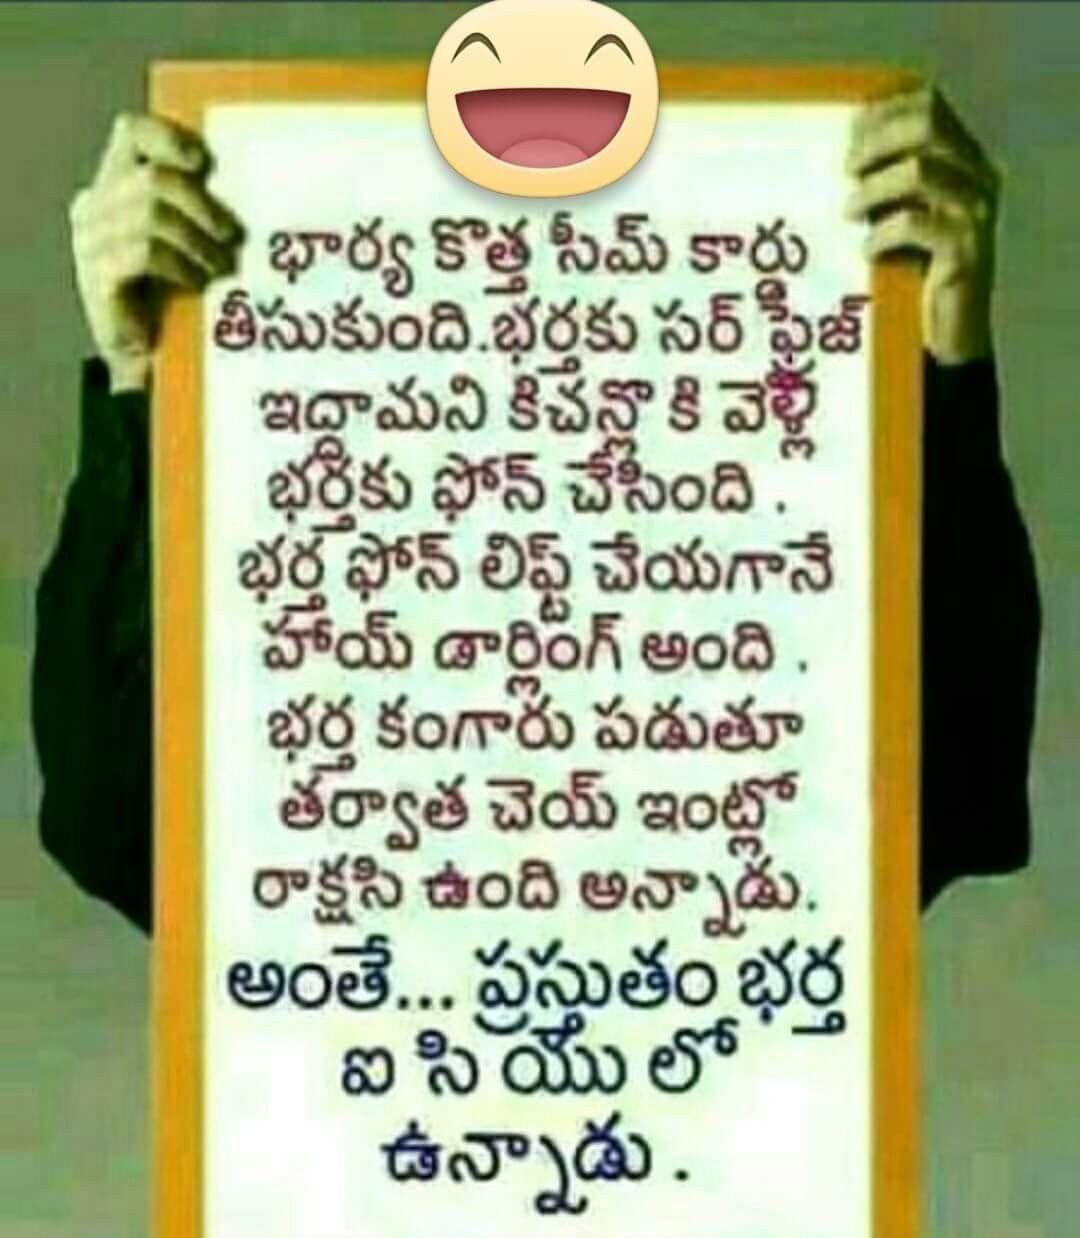 Pin By Phanikavuluri On Telugu Jokes Telugu Jokes Fun Quotes Funny Jokes